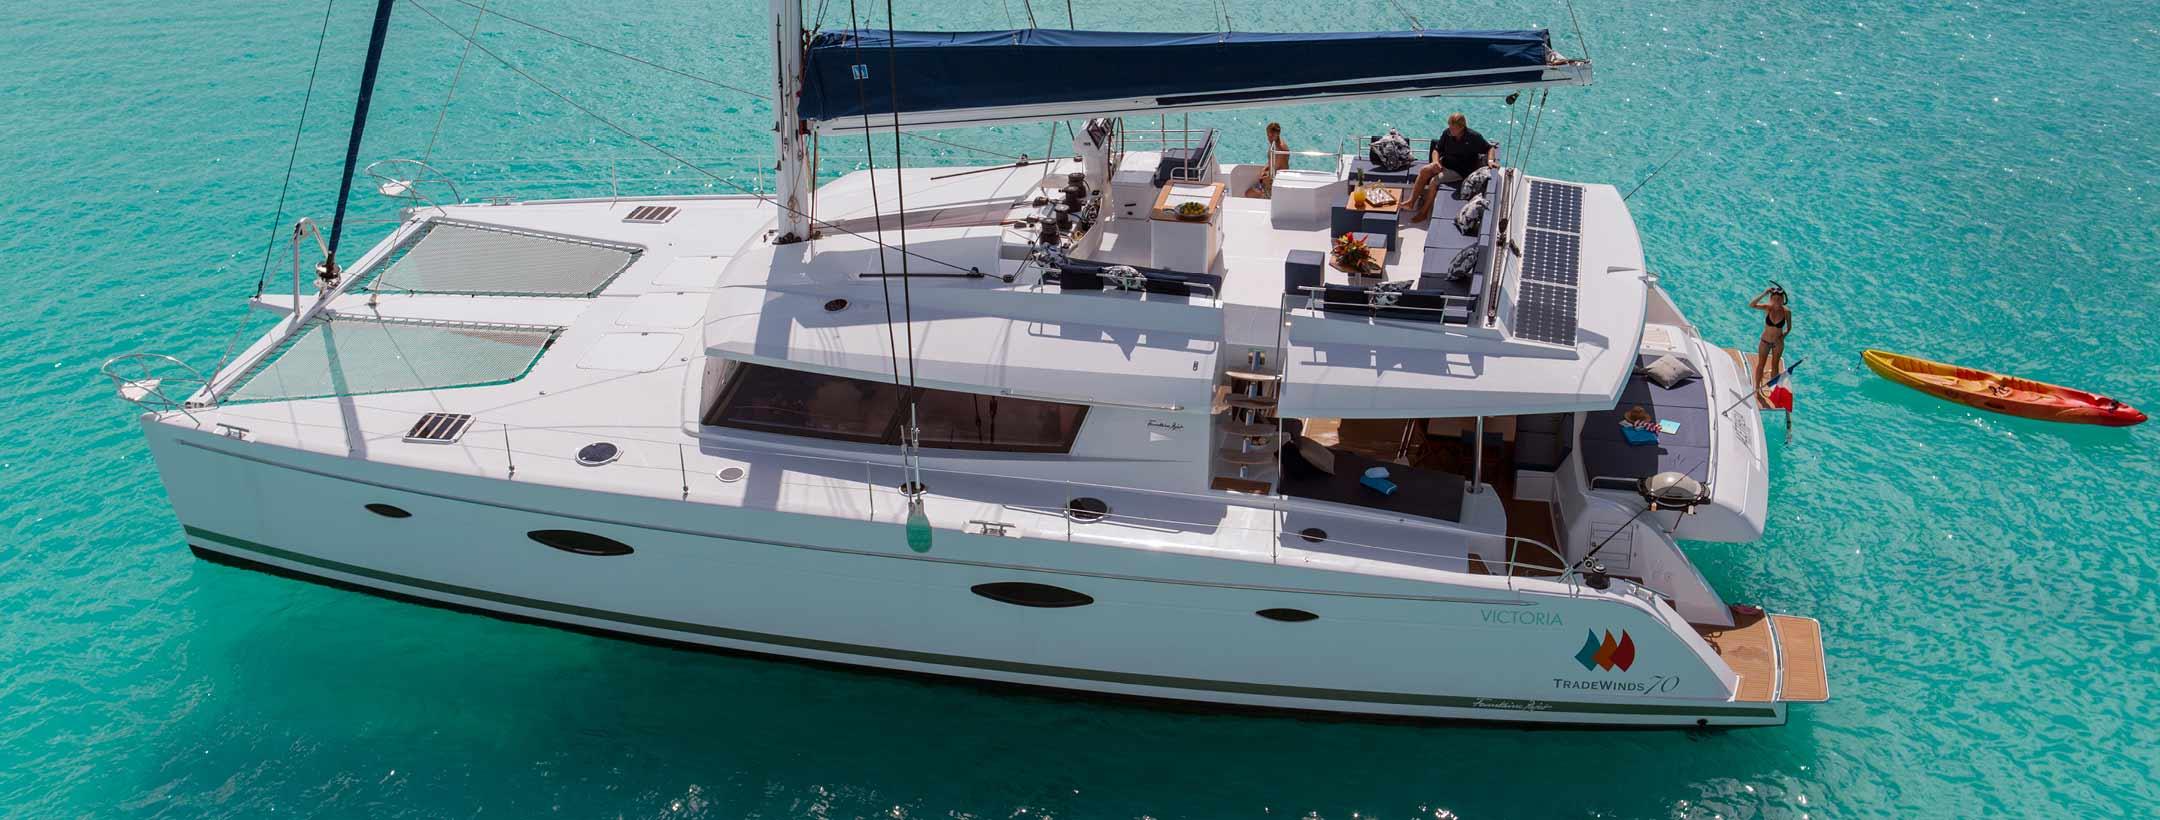 TradeWinds 70 ALETHEIA flagship class yacht